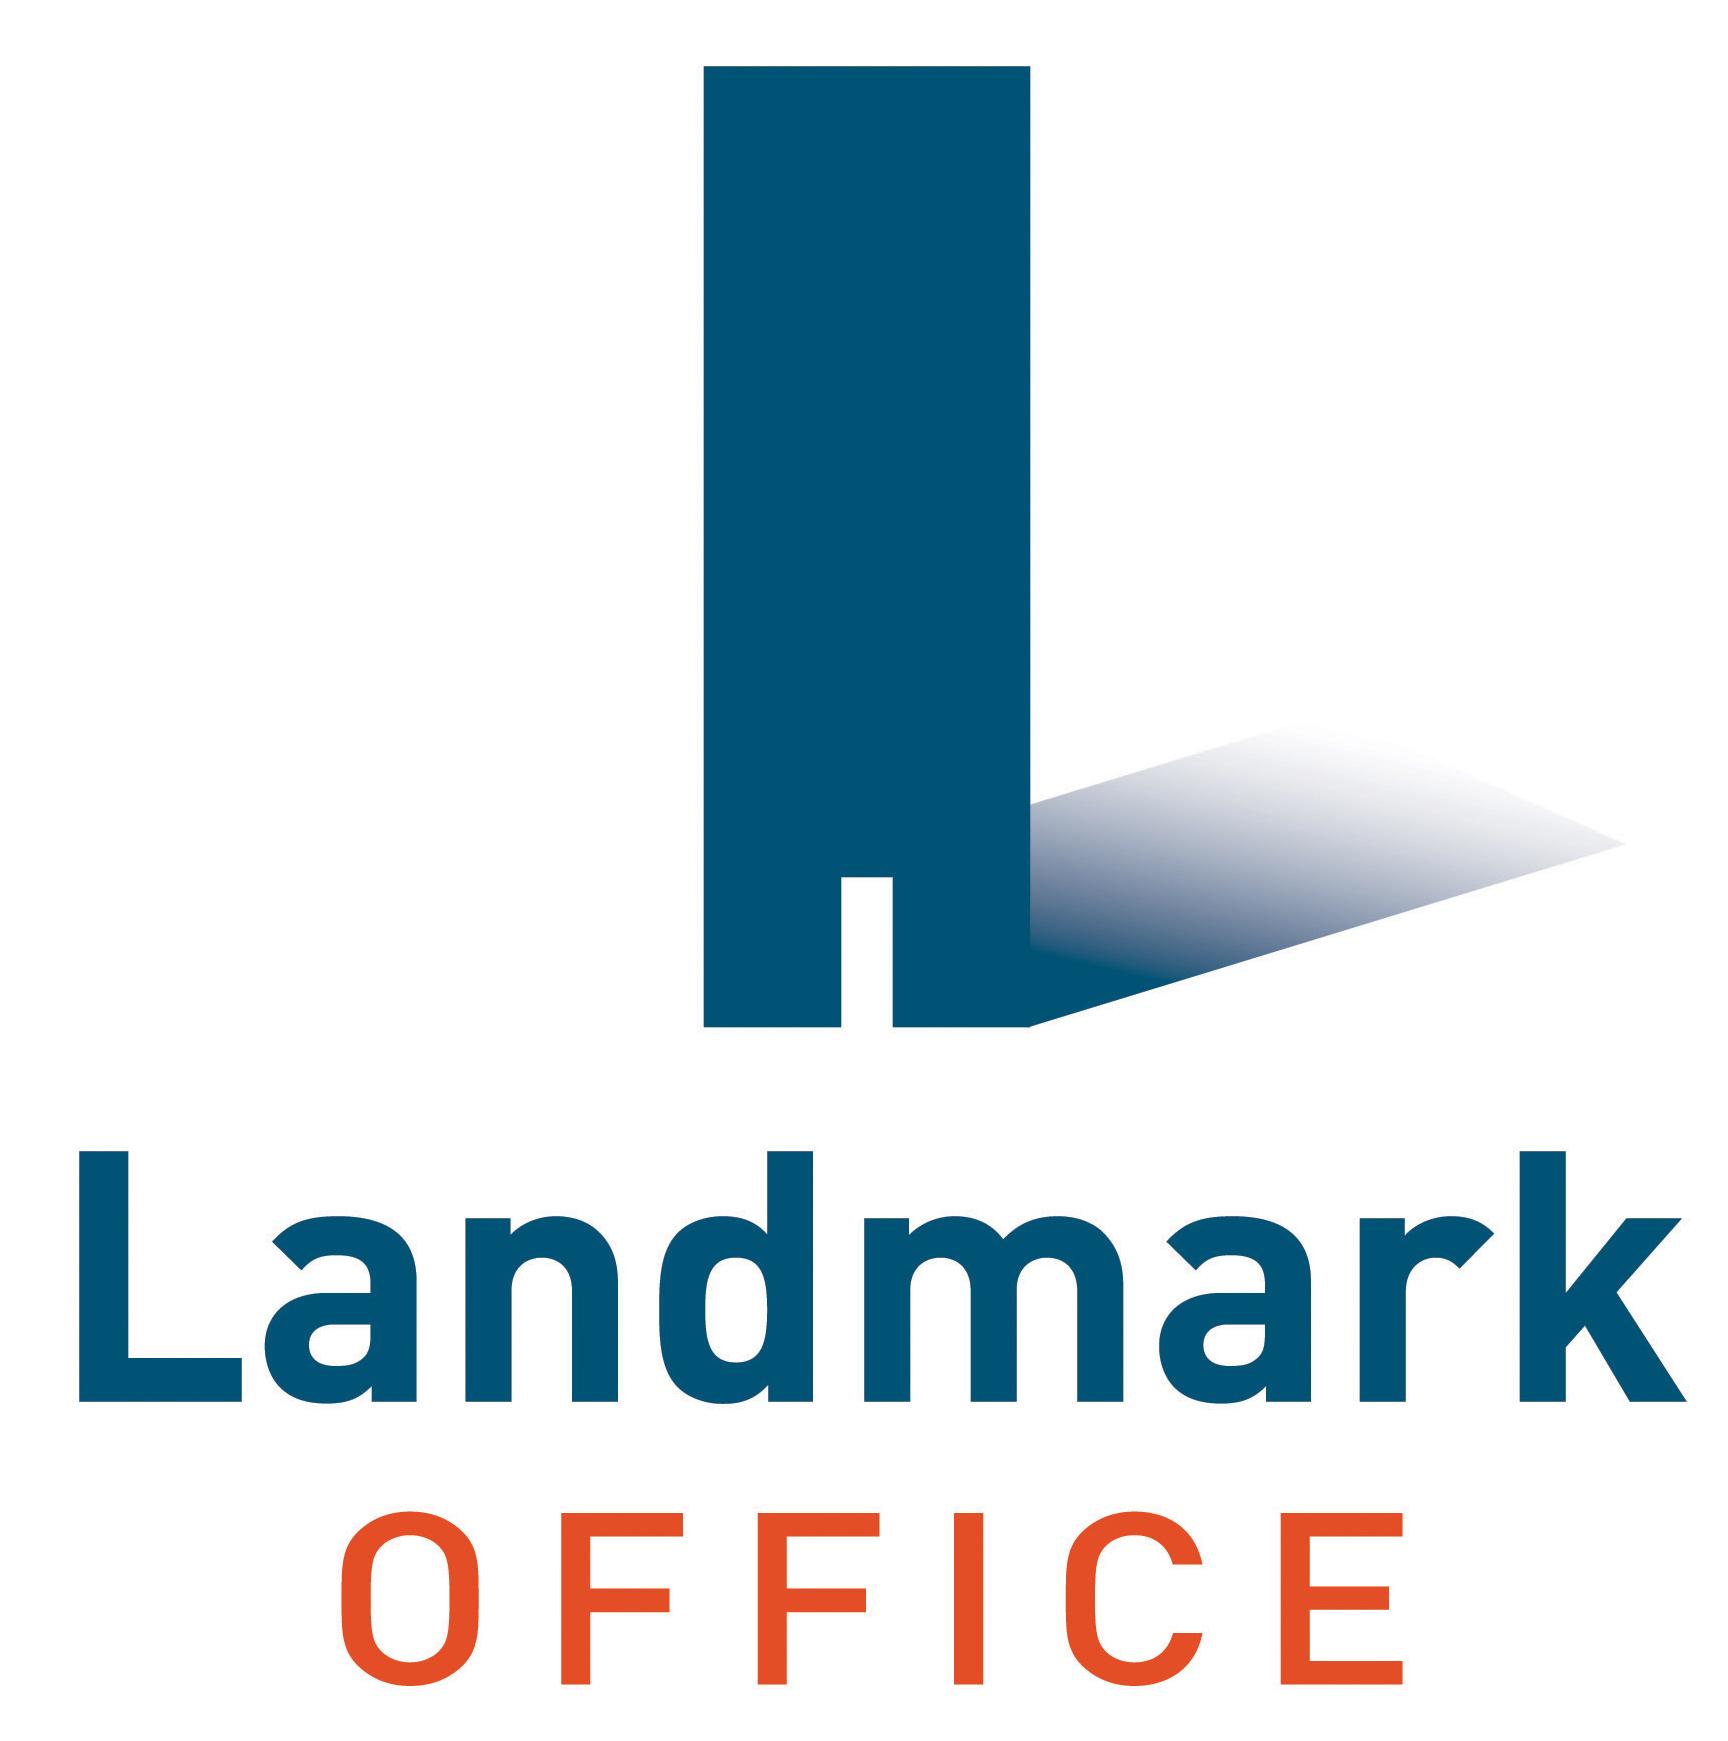 Landmark Office